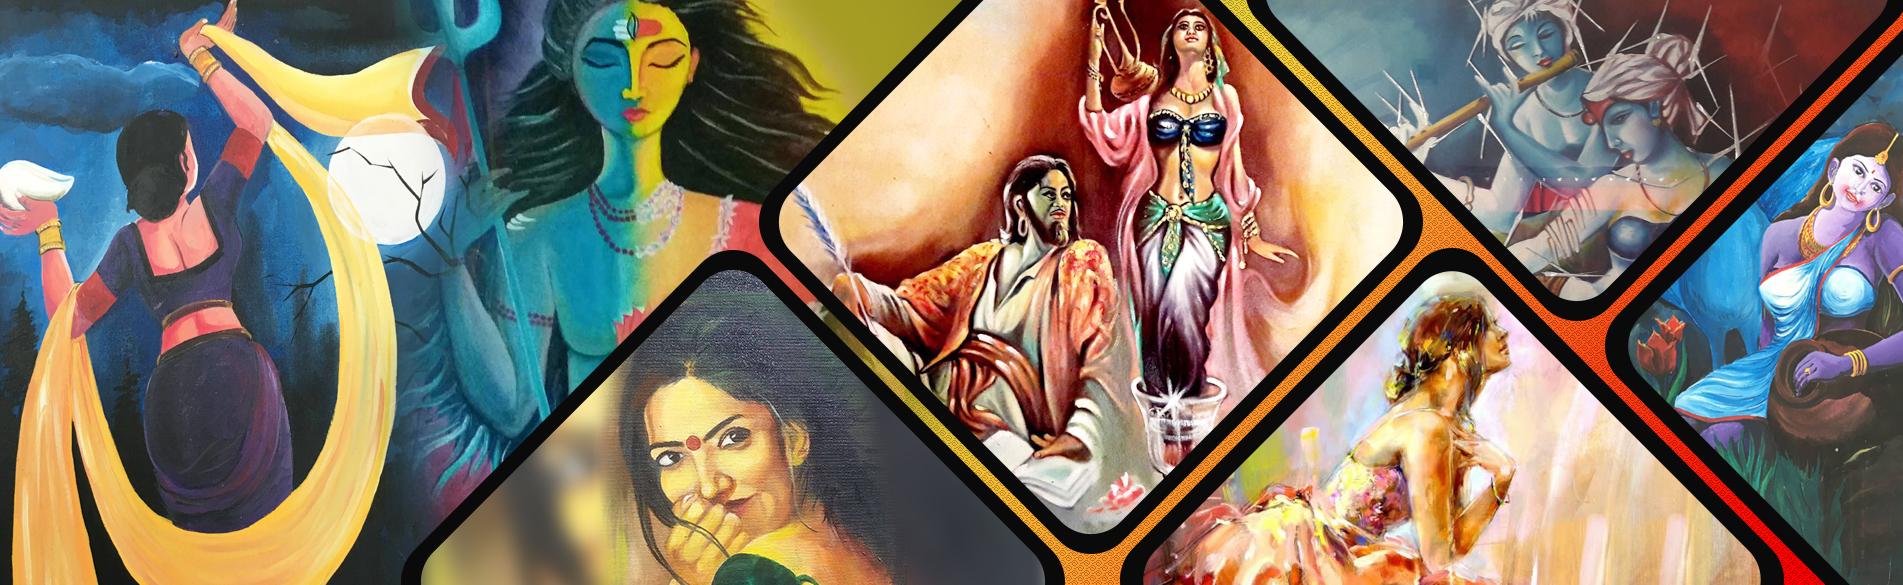 Exibitart India S Famous Handmade Paintings Gallery Buy Online